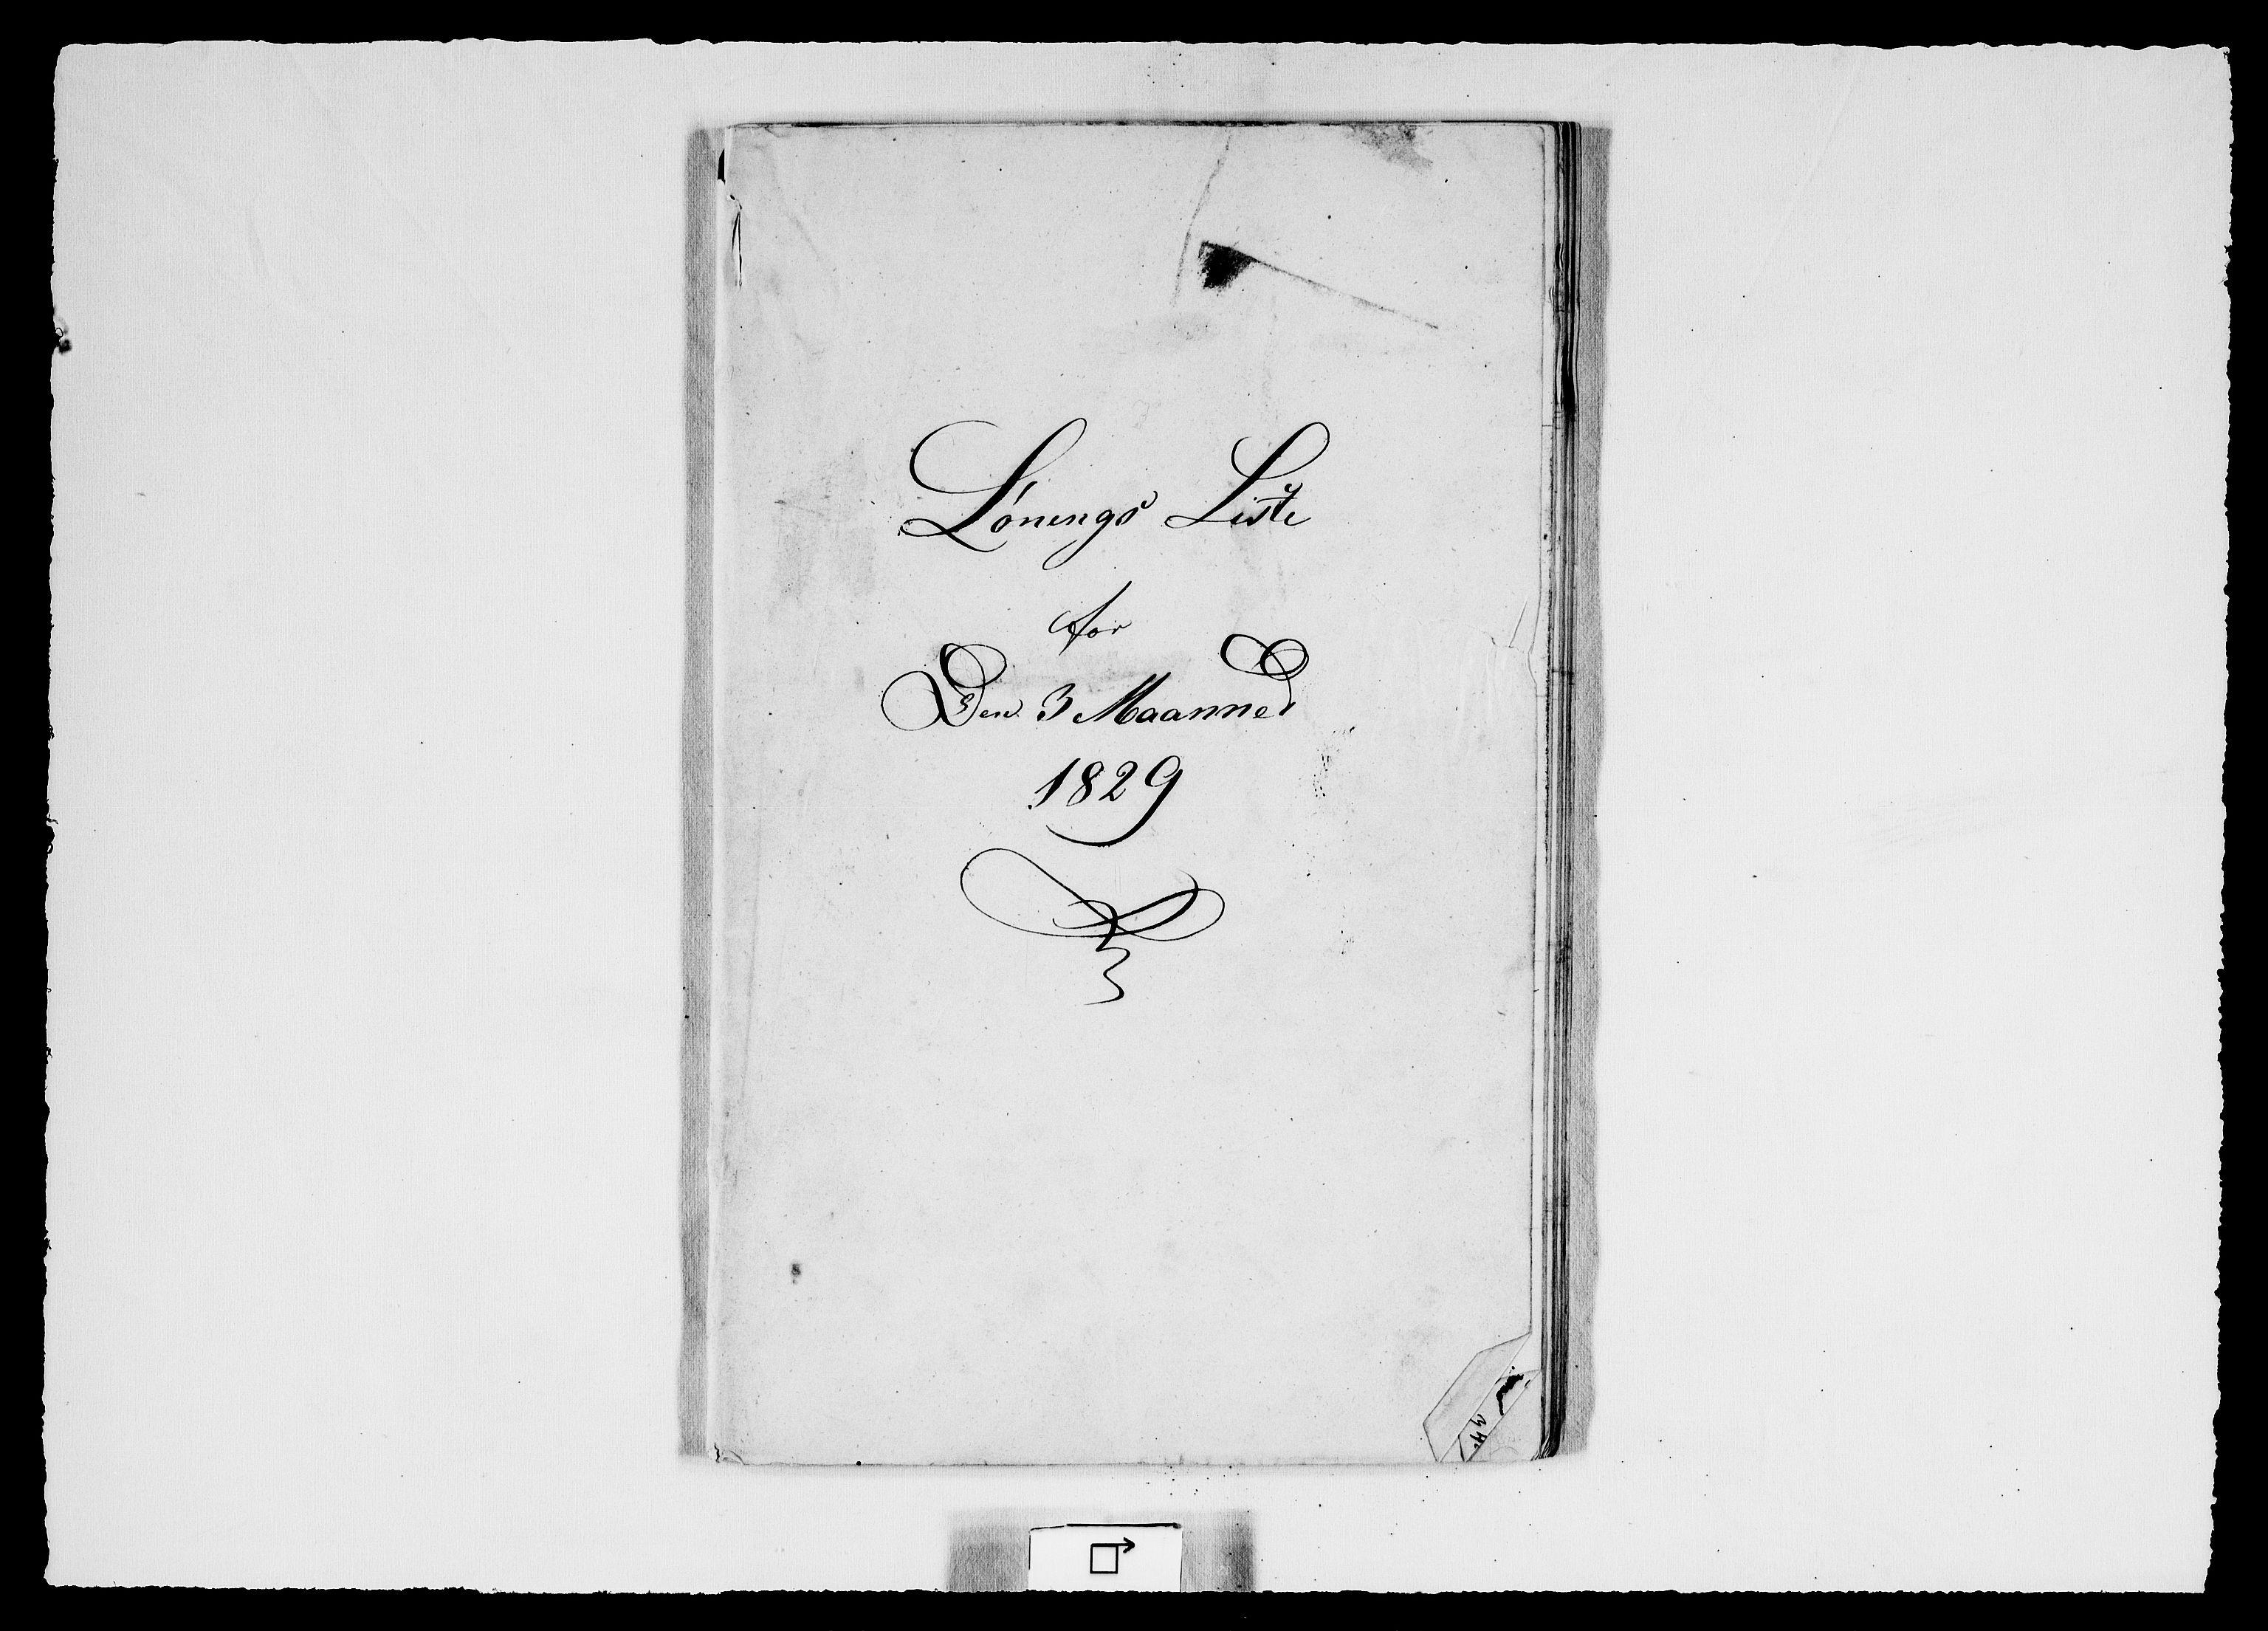 RA, Modums Blaafarveværk, G/Gd/Gdd/L0293, 1829, s. 2